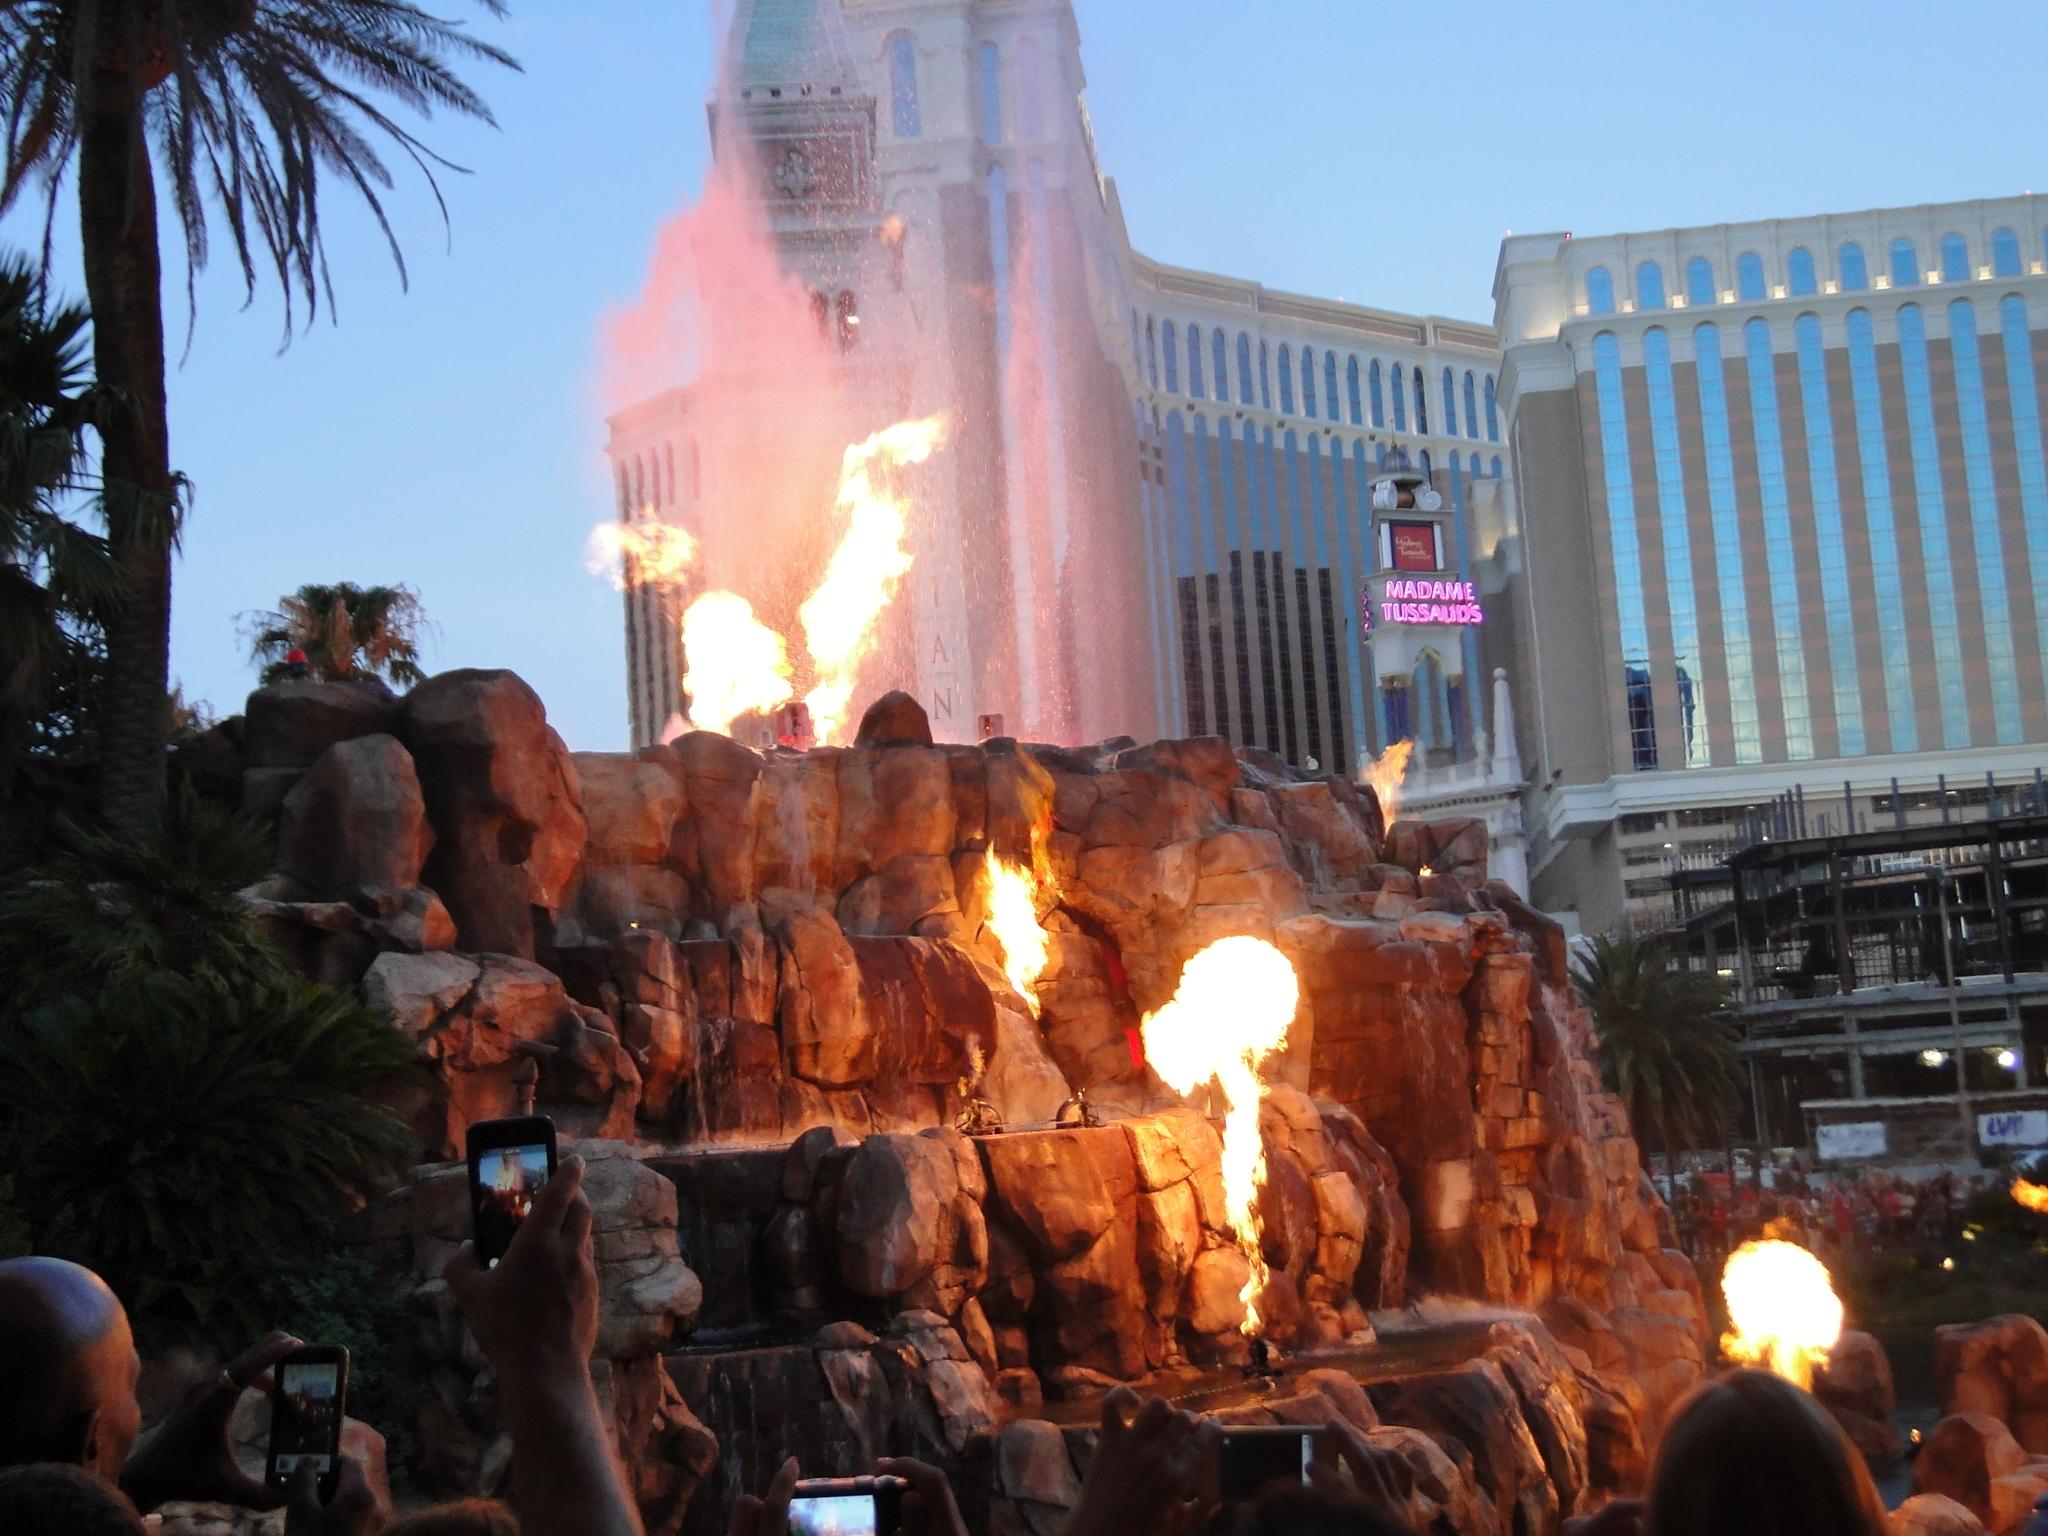 Vegas Mirage vulcão